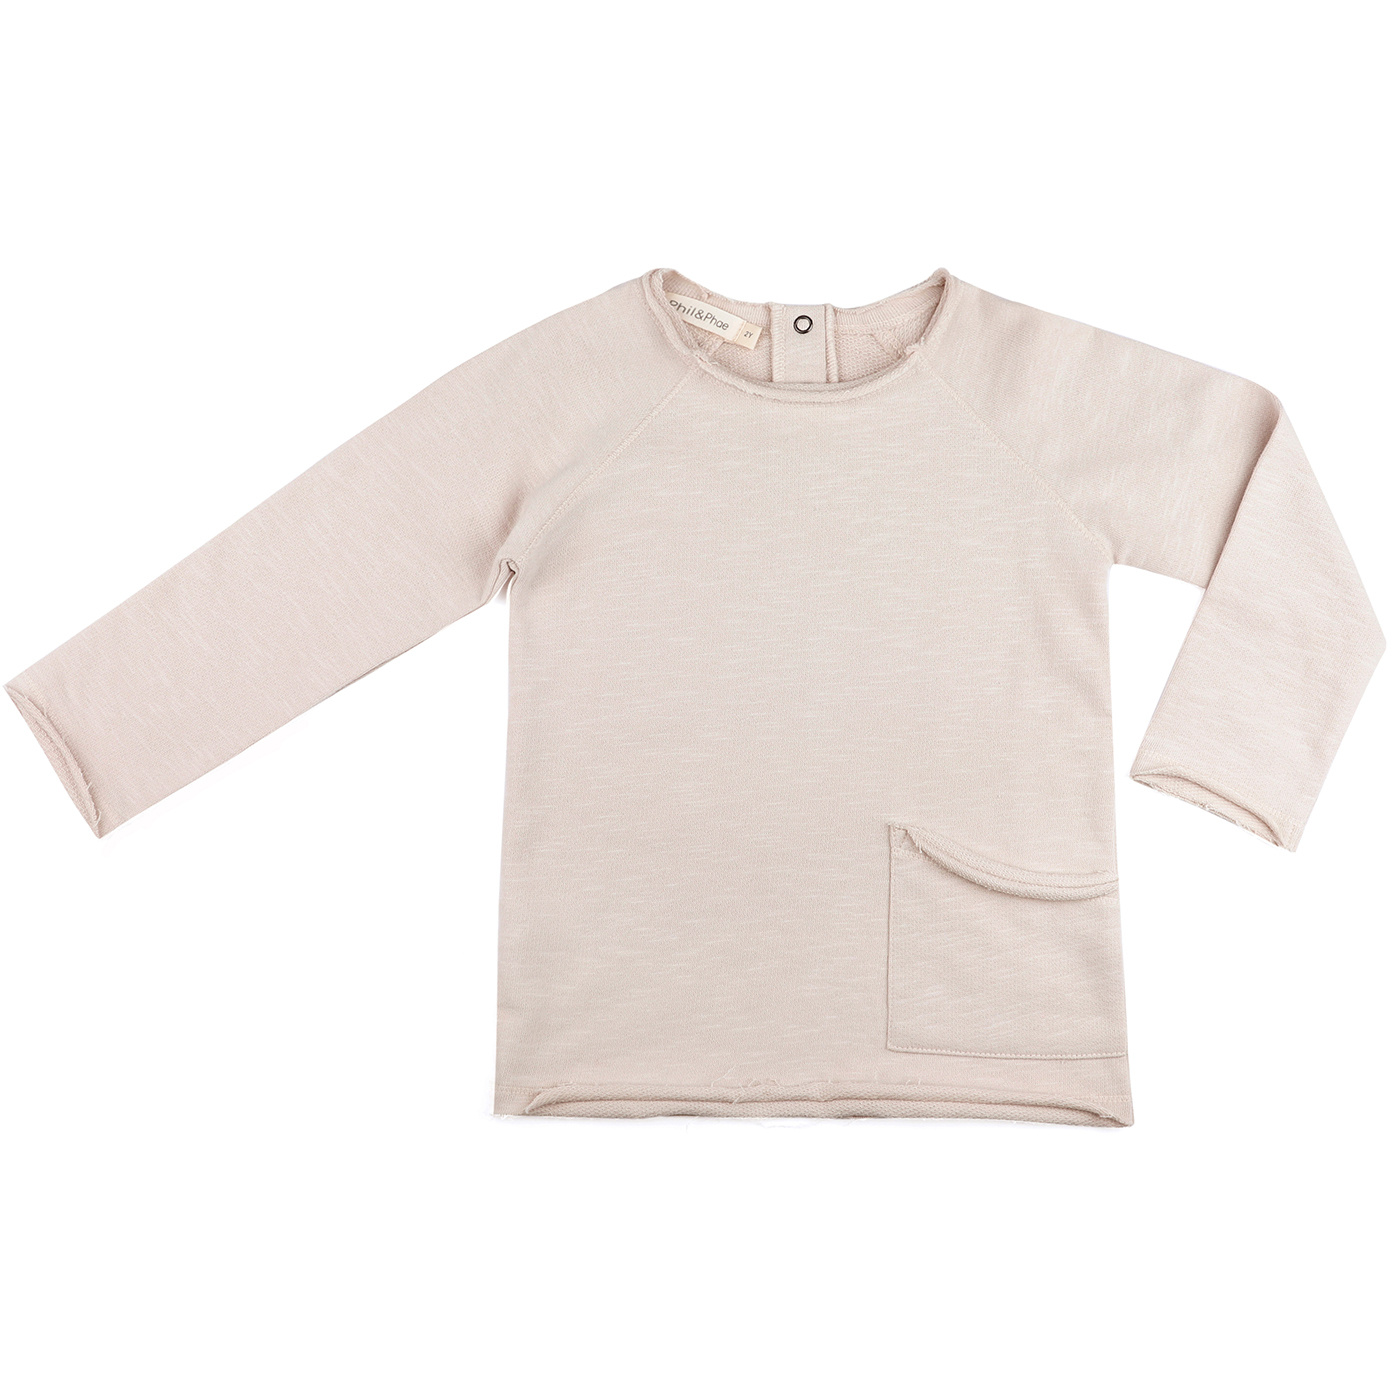 Raw-edged sweater - Oatmeal-1